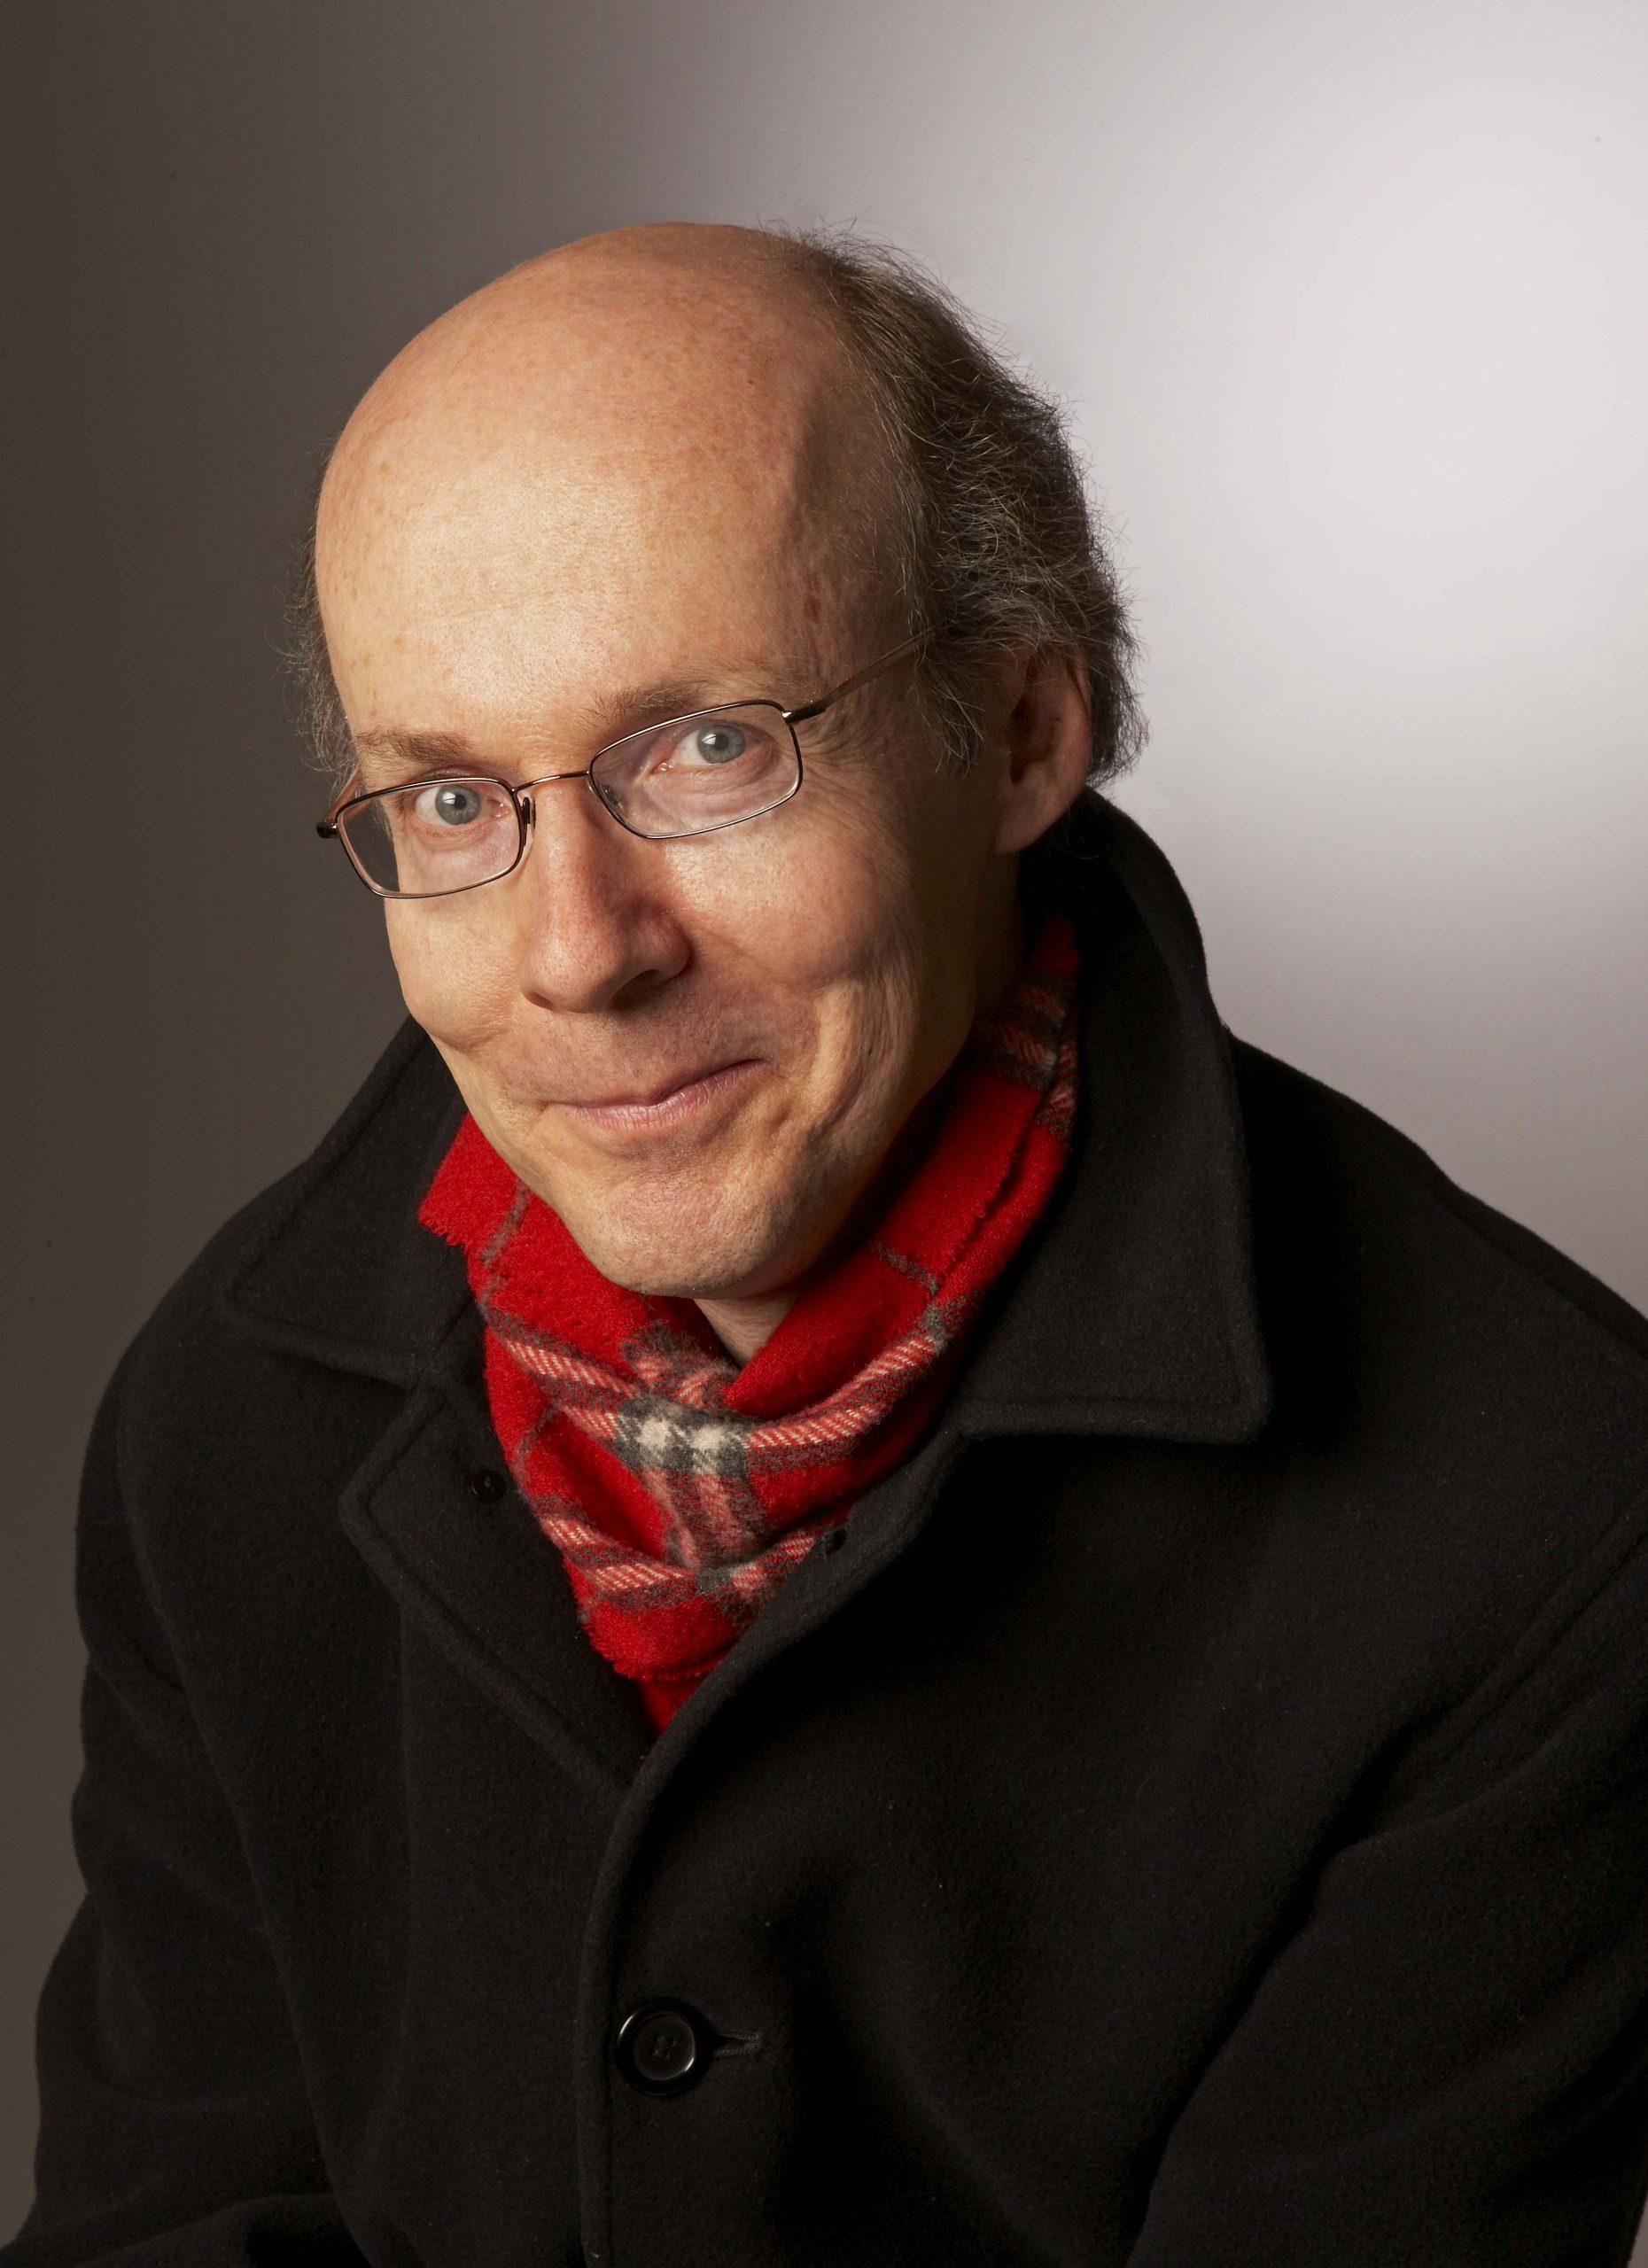 David Fallis